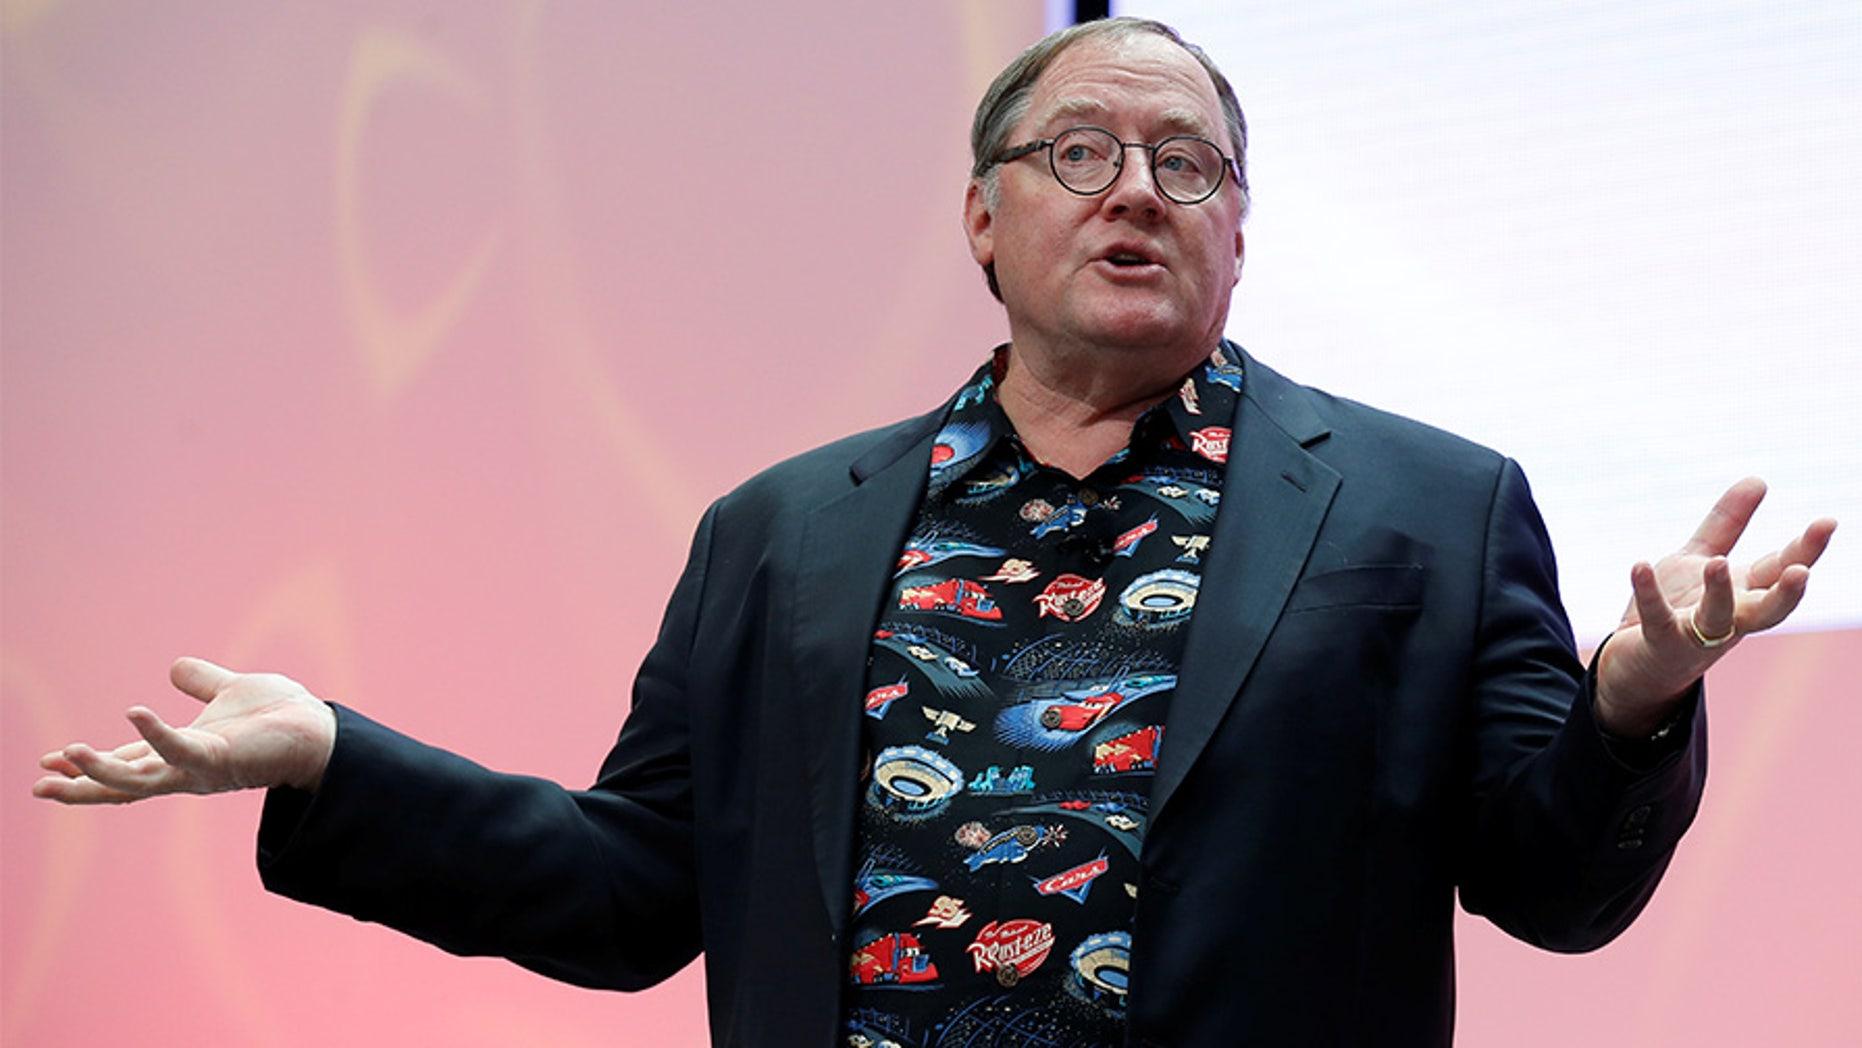 John Lasseter, Chief Creative Officer of Walt Disney and Pixar Animation Studios, speaks during the North American International Auto Show in Detroit, Michigan, U.S., January 8, 2017.  REUTERS/Brendan McDermid - RC1F00107D90